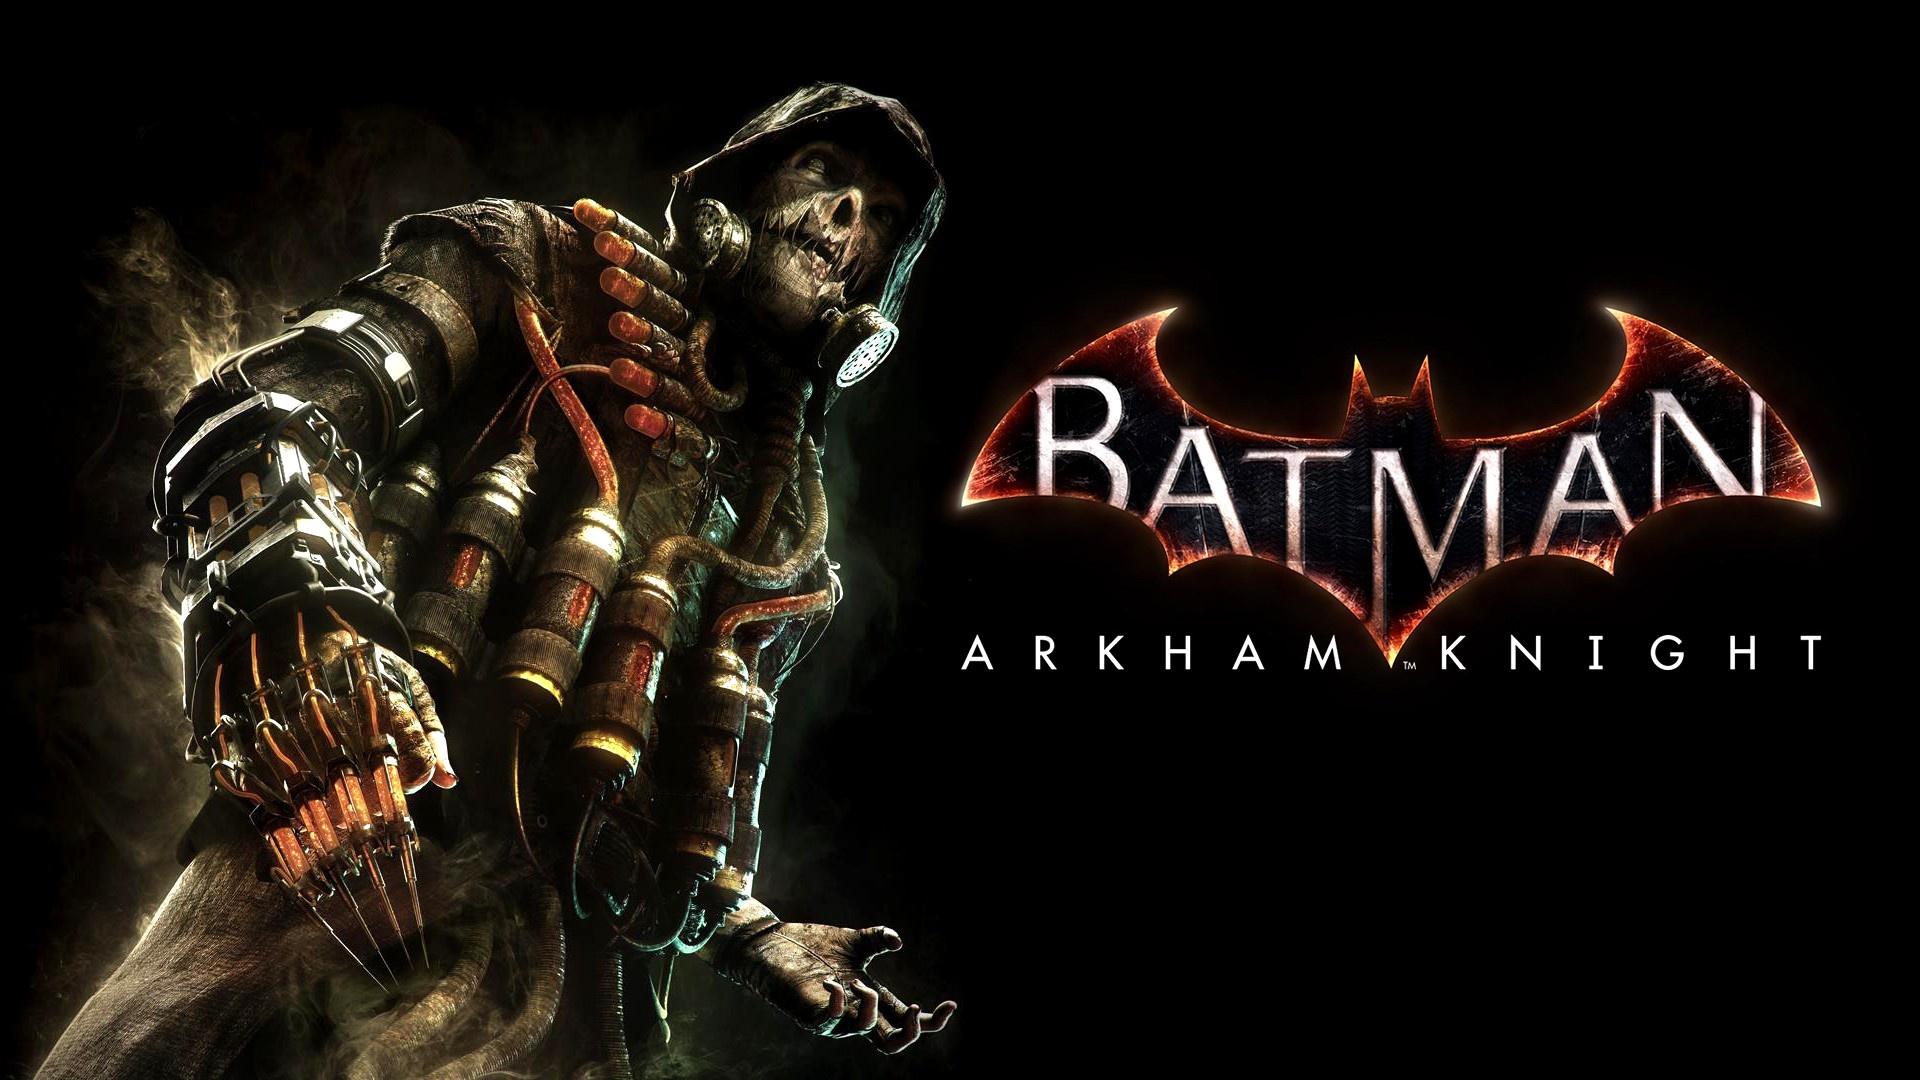 Batman Arkham Knight Scarecrow Wallpapers   1920x1080   445020 1920x1080